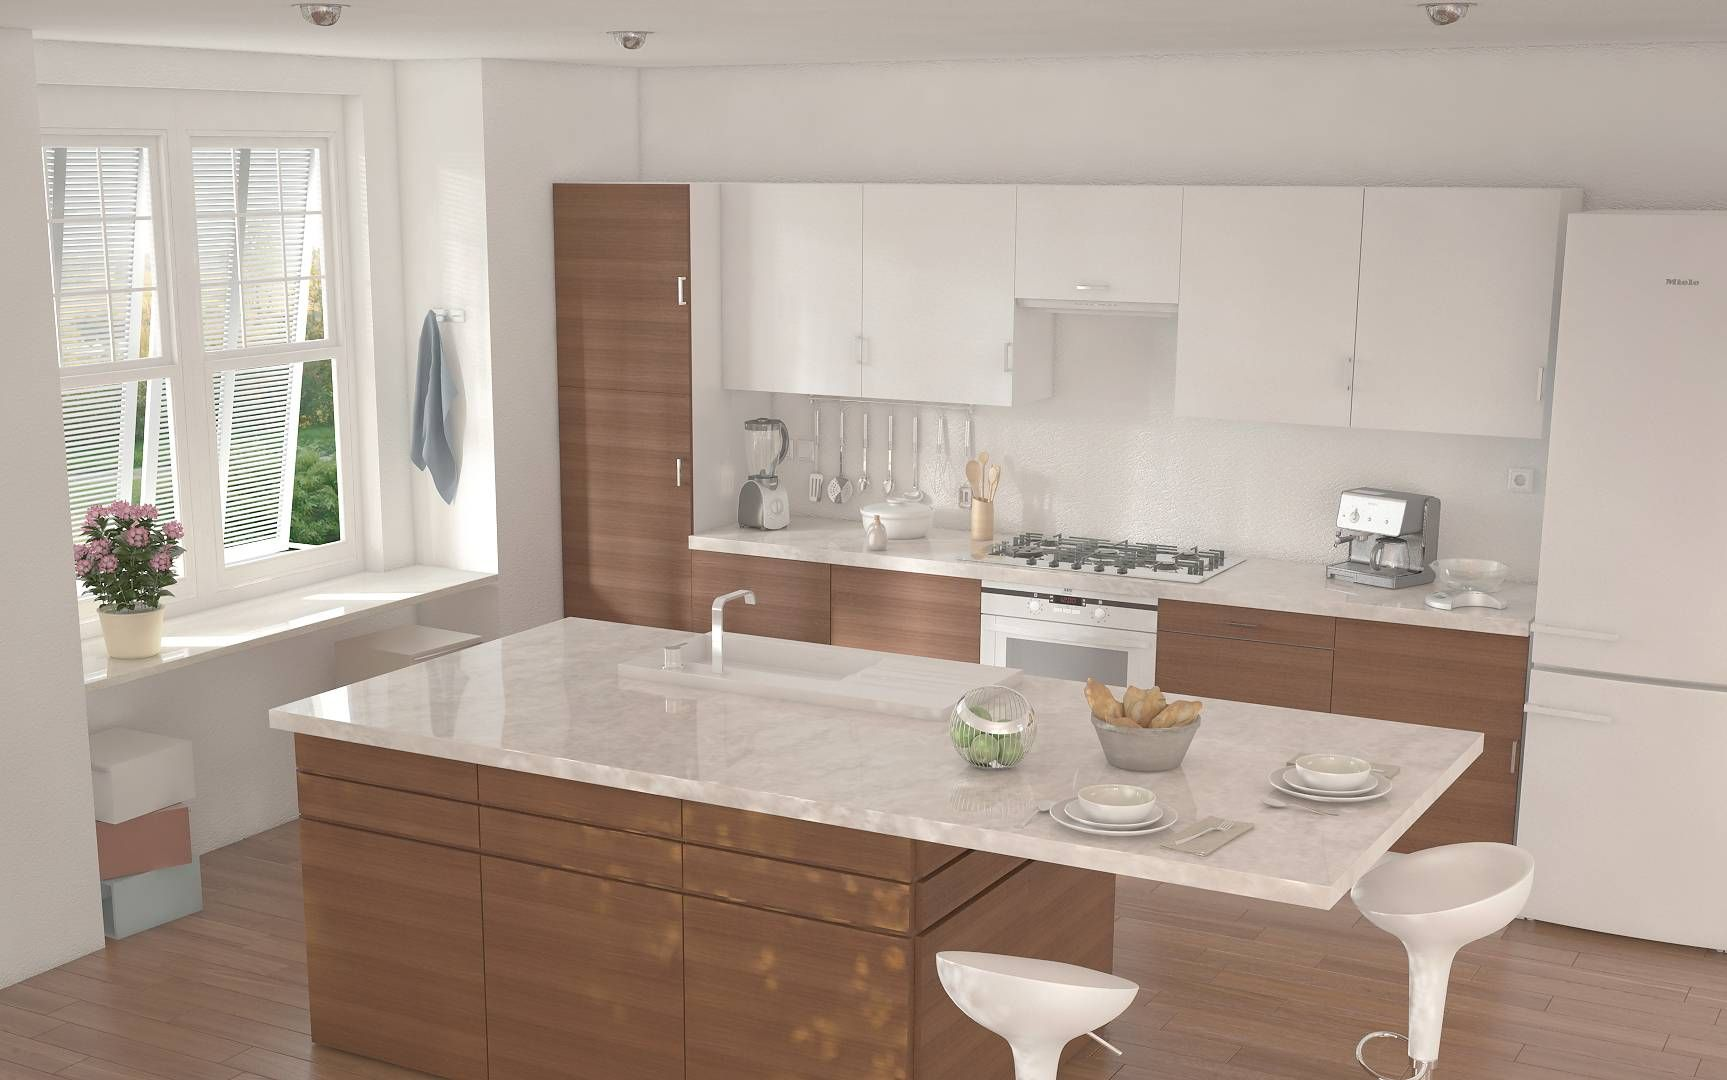 cucina con isola centrale ikea  Cerca con Google  Cucina